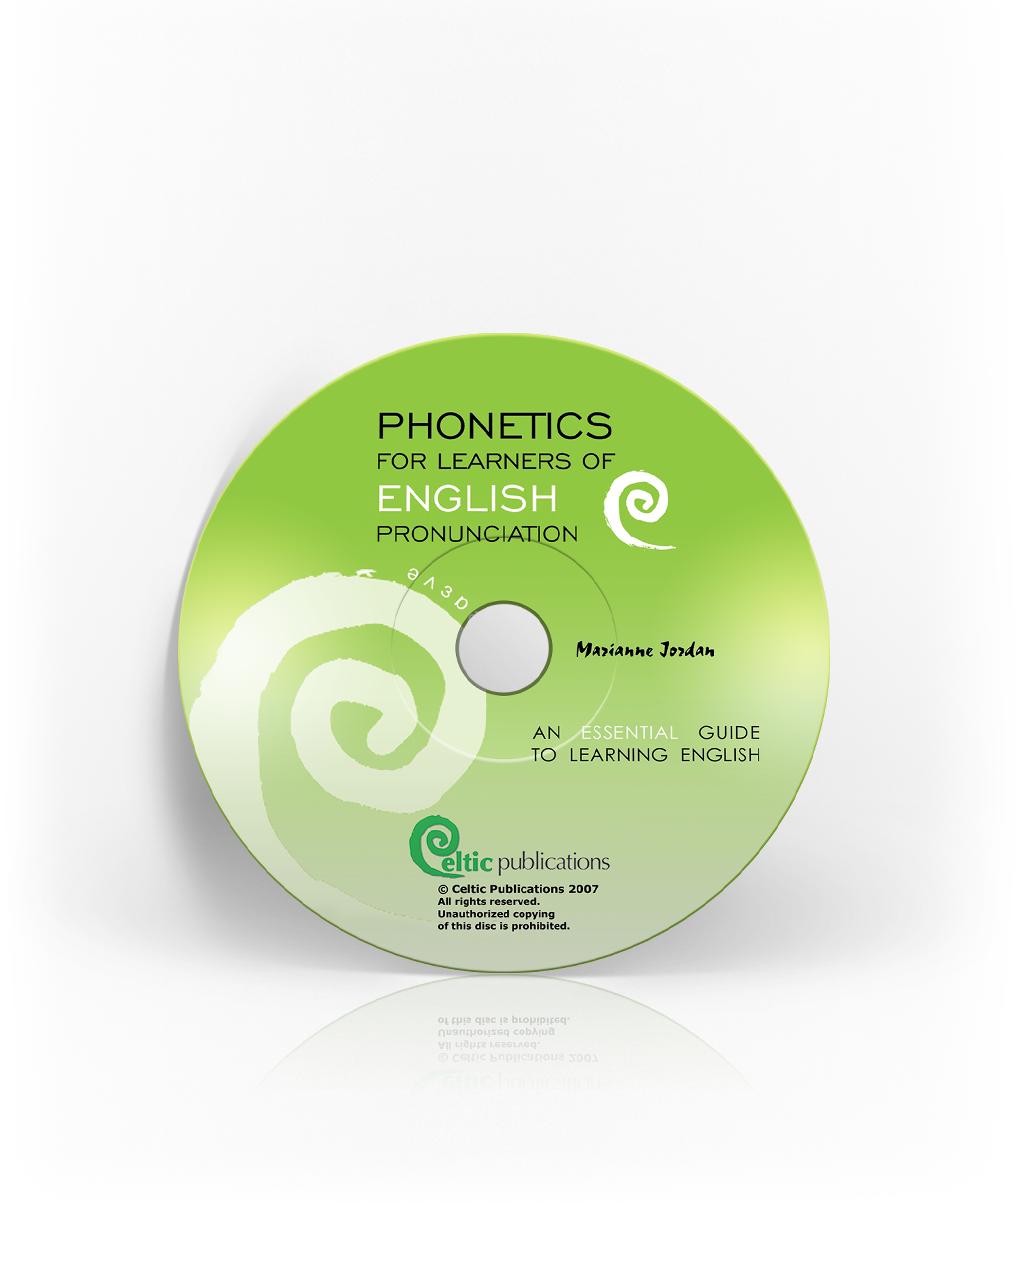 Phonetics for Learning of English Pronunciation - Audio CD